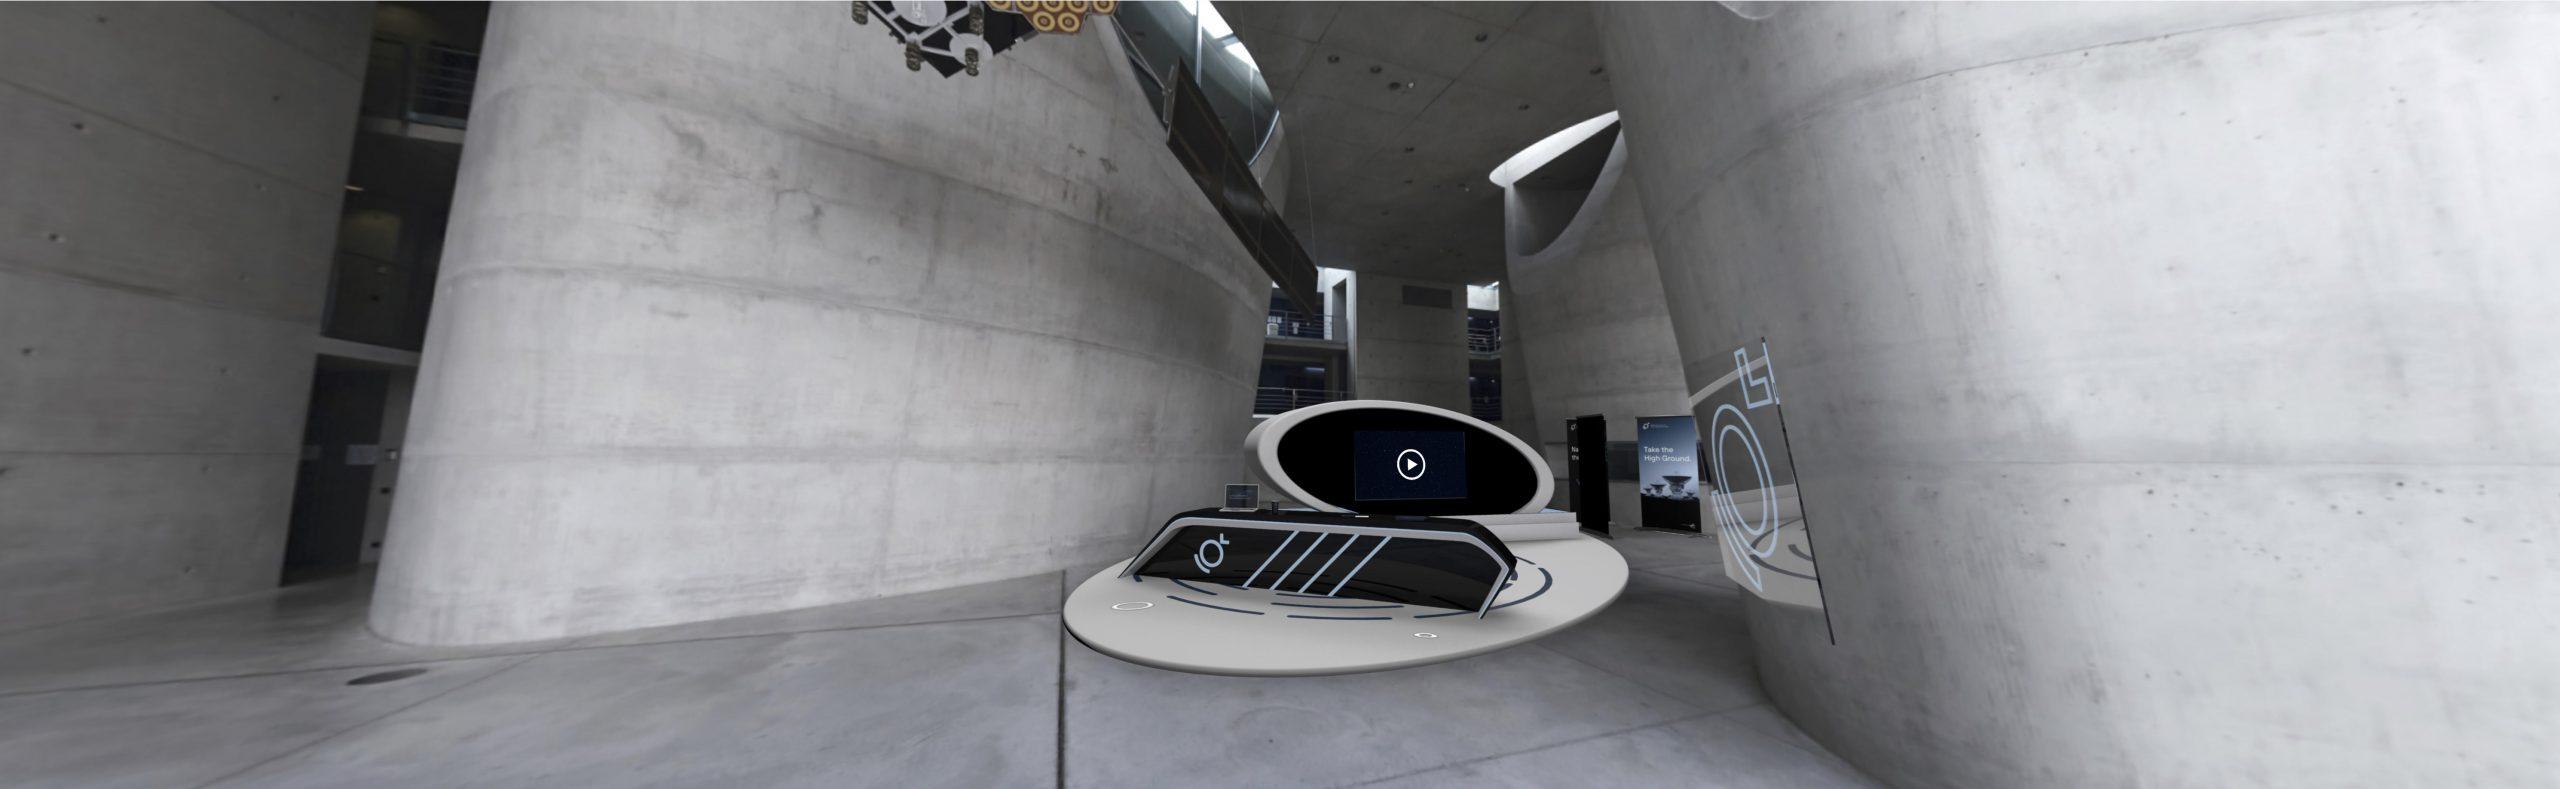 Digitale Einblicke in das Galileo Kontrollzentrum